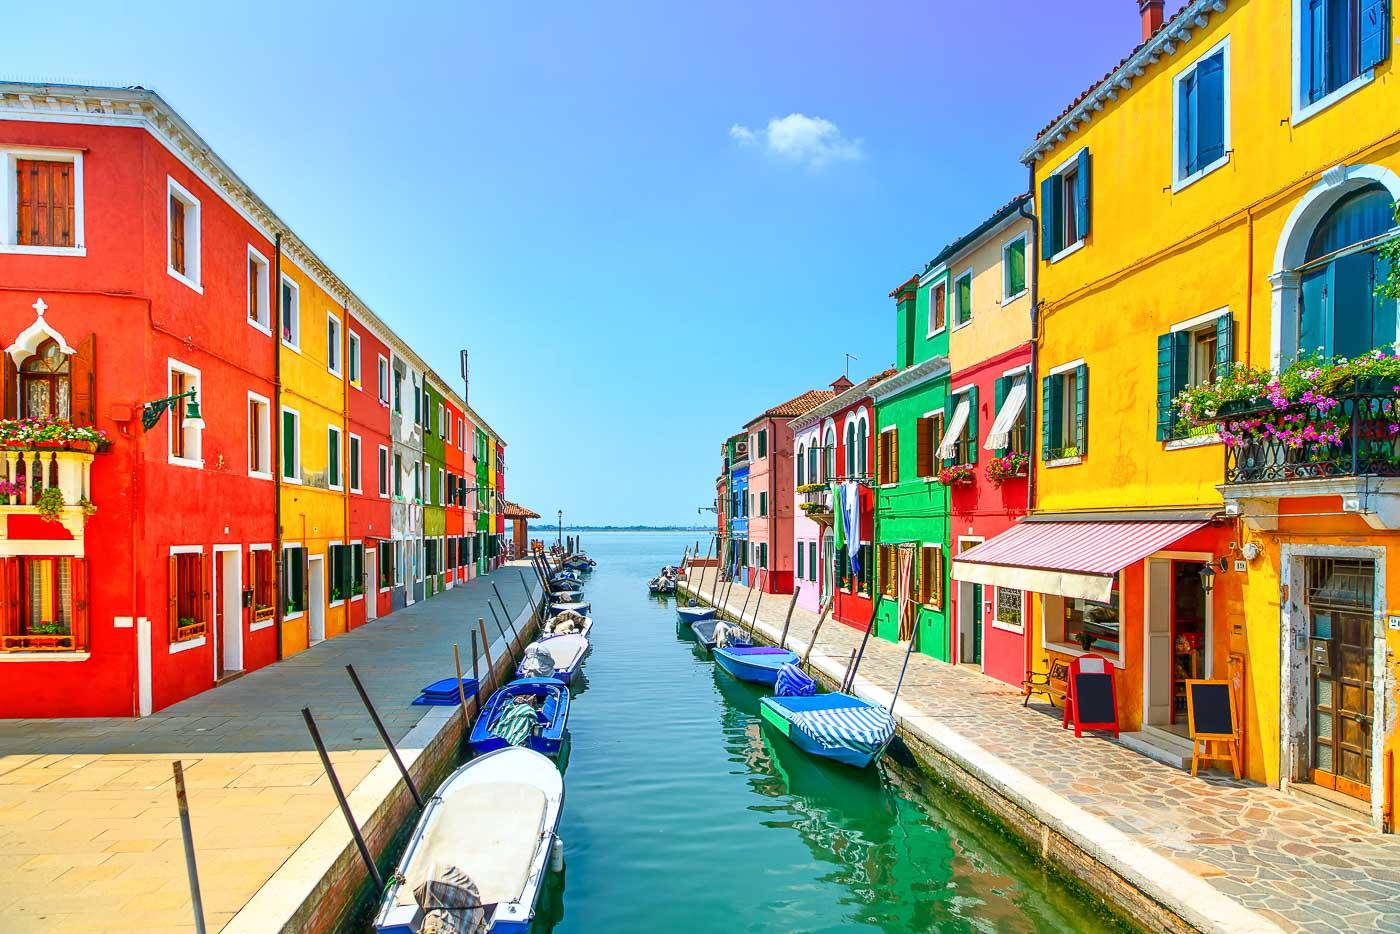 Colourful Cities by Zayah World - Burano, Italy